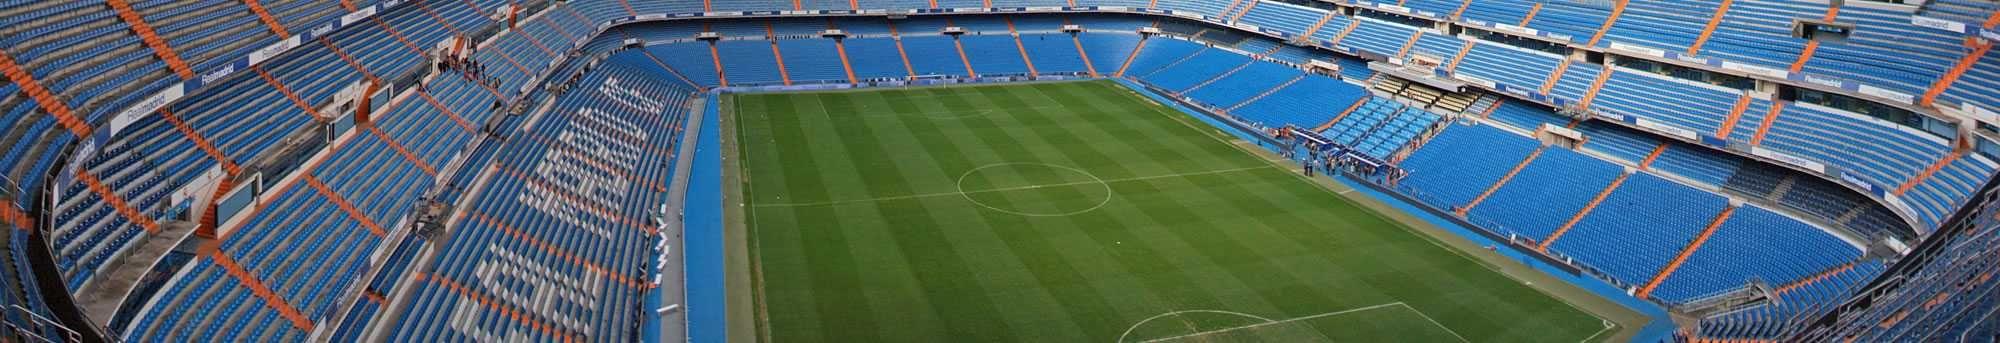 Tour Estadio Santiago Bernabéu